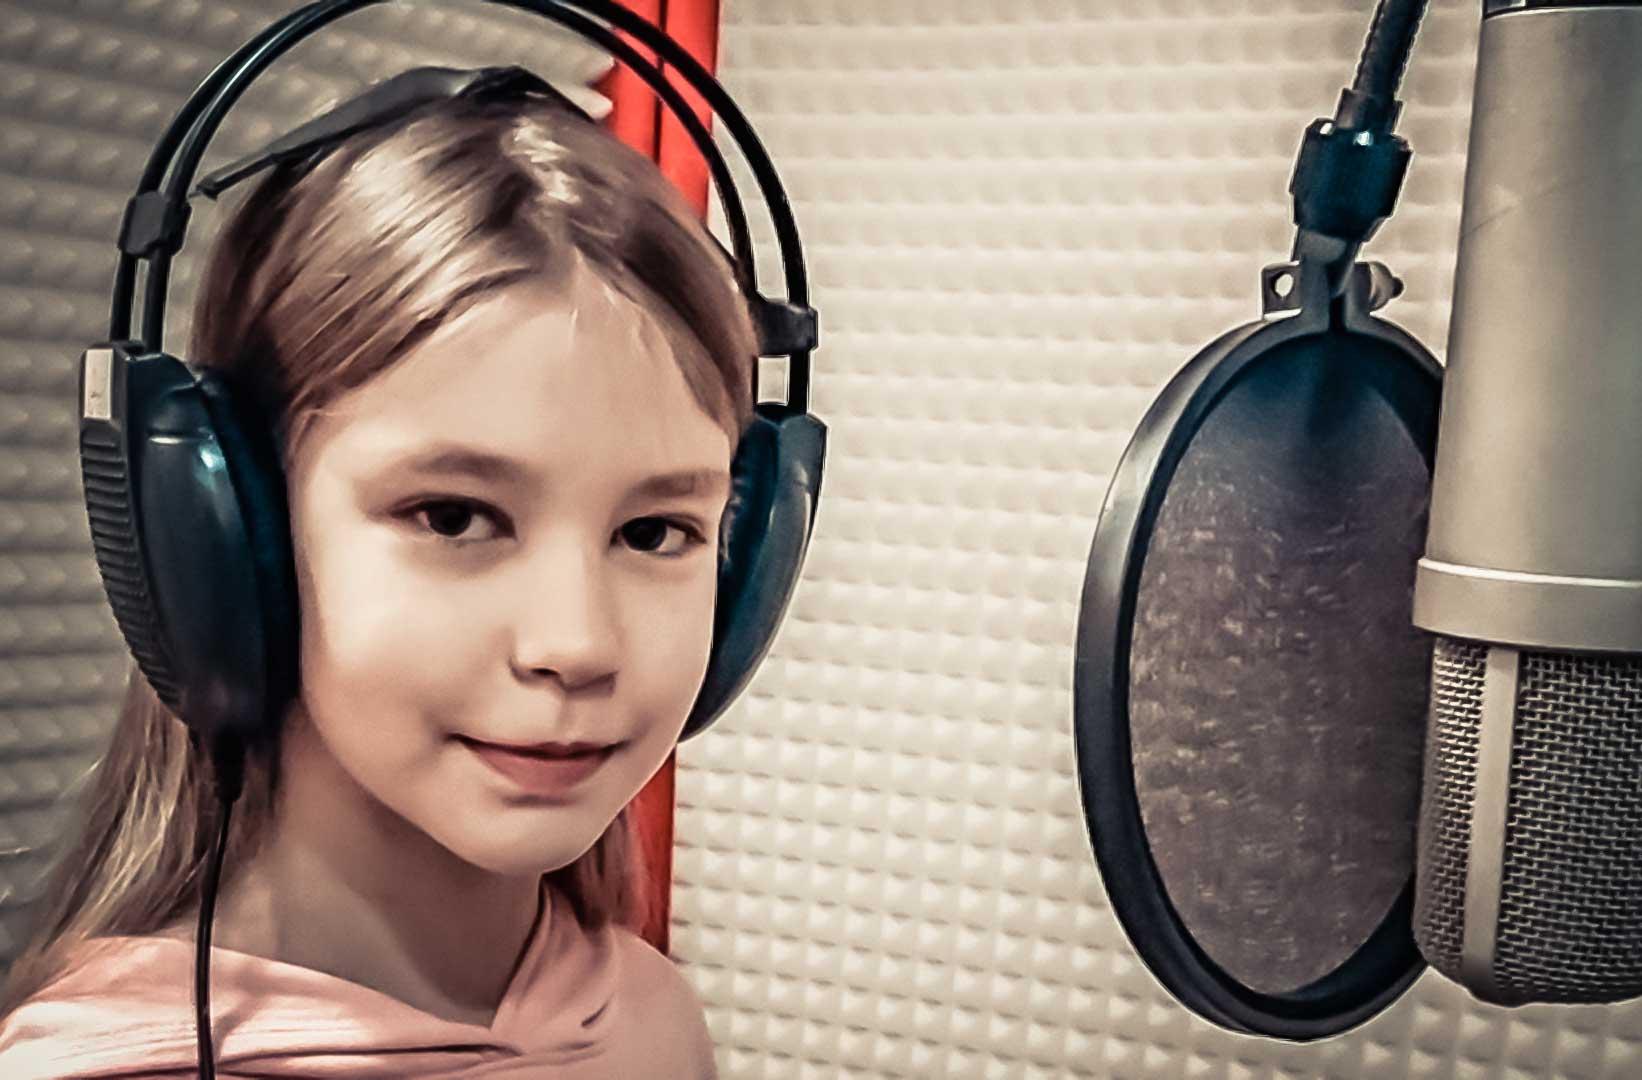 Mária Magdaléna Torňošová – Ockovo zlato (Letí pieseň, letí 2017)